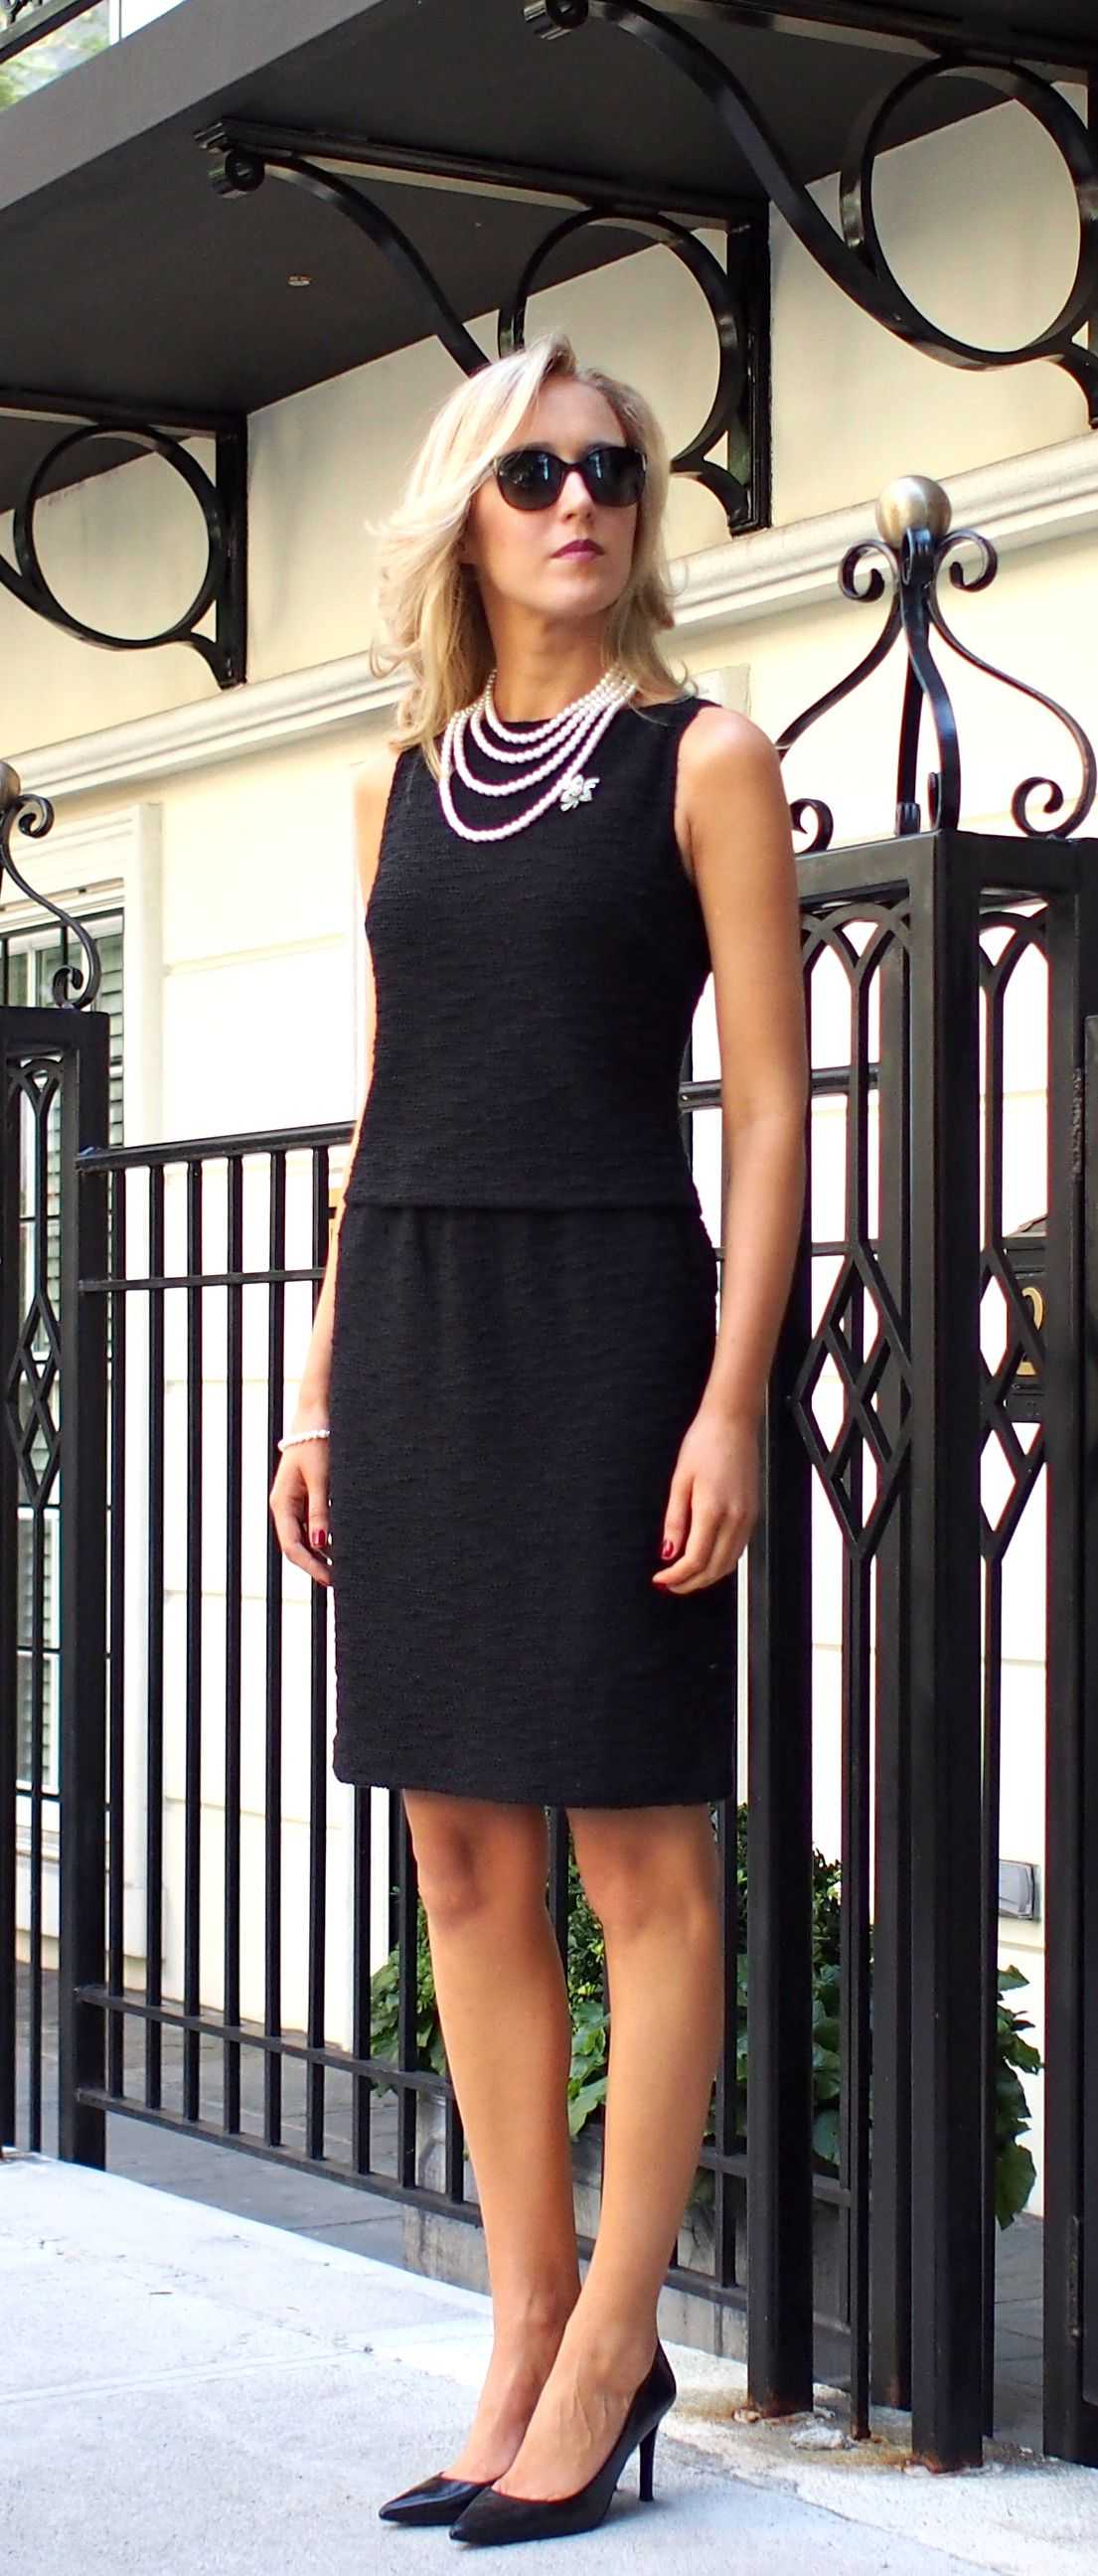 The Classy Cubicle Classic Perfect Black Dress For Work Office Professional Office Women St John Prada Ralph Lauren Bla Schwarzes Kleid Kleider Mode [ 2592 x 1105 Pixel ]